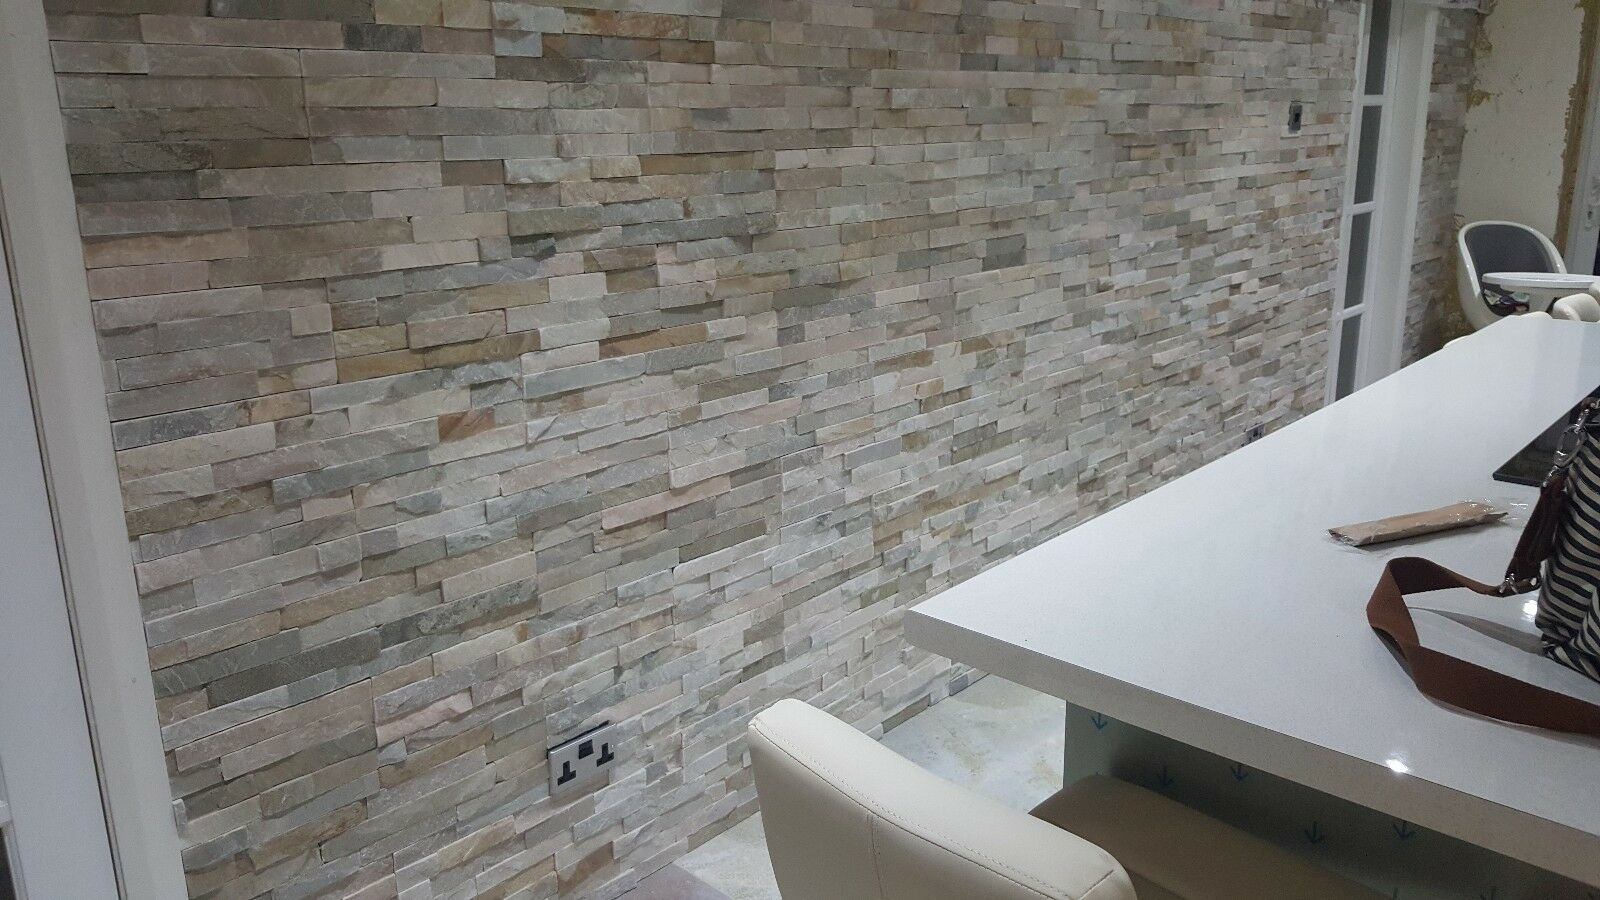 Oyster Random Beige Slate Split Face Cladding Mosaic Tiles for Wall ...